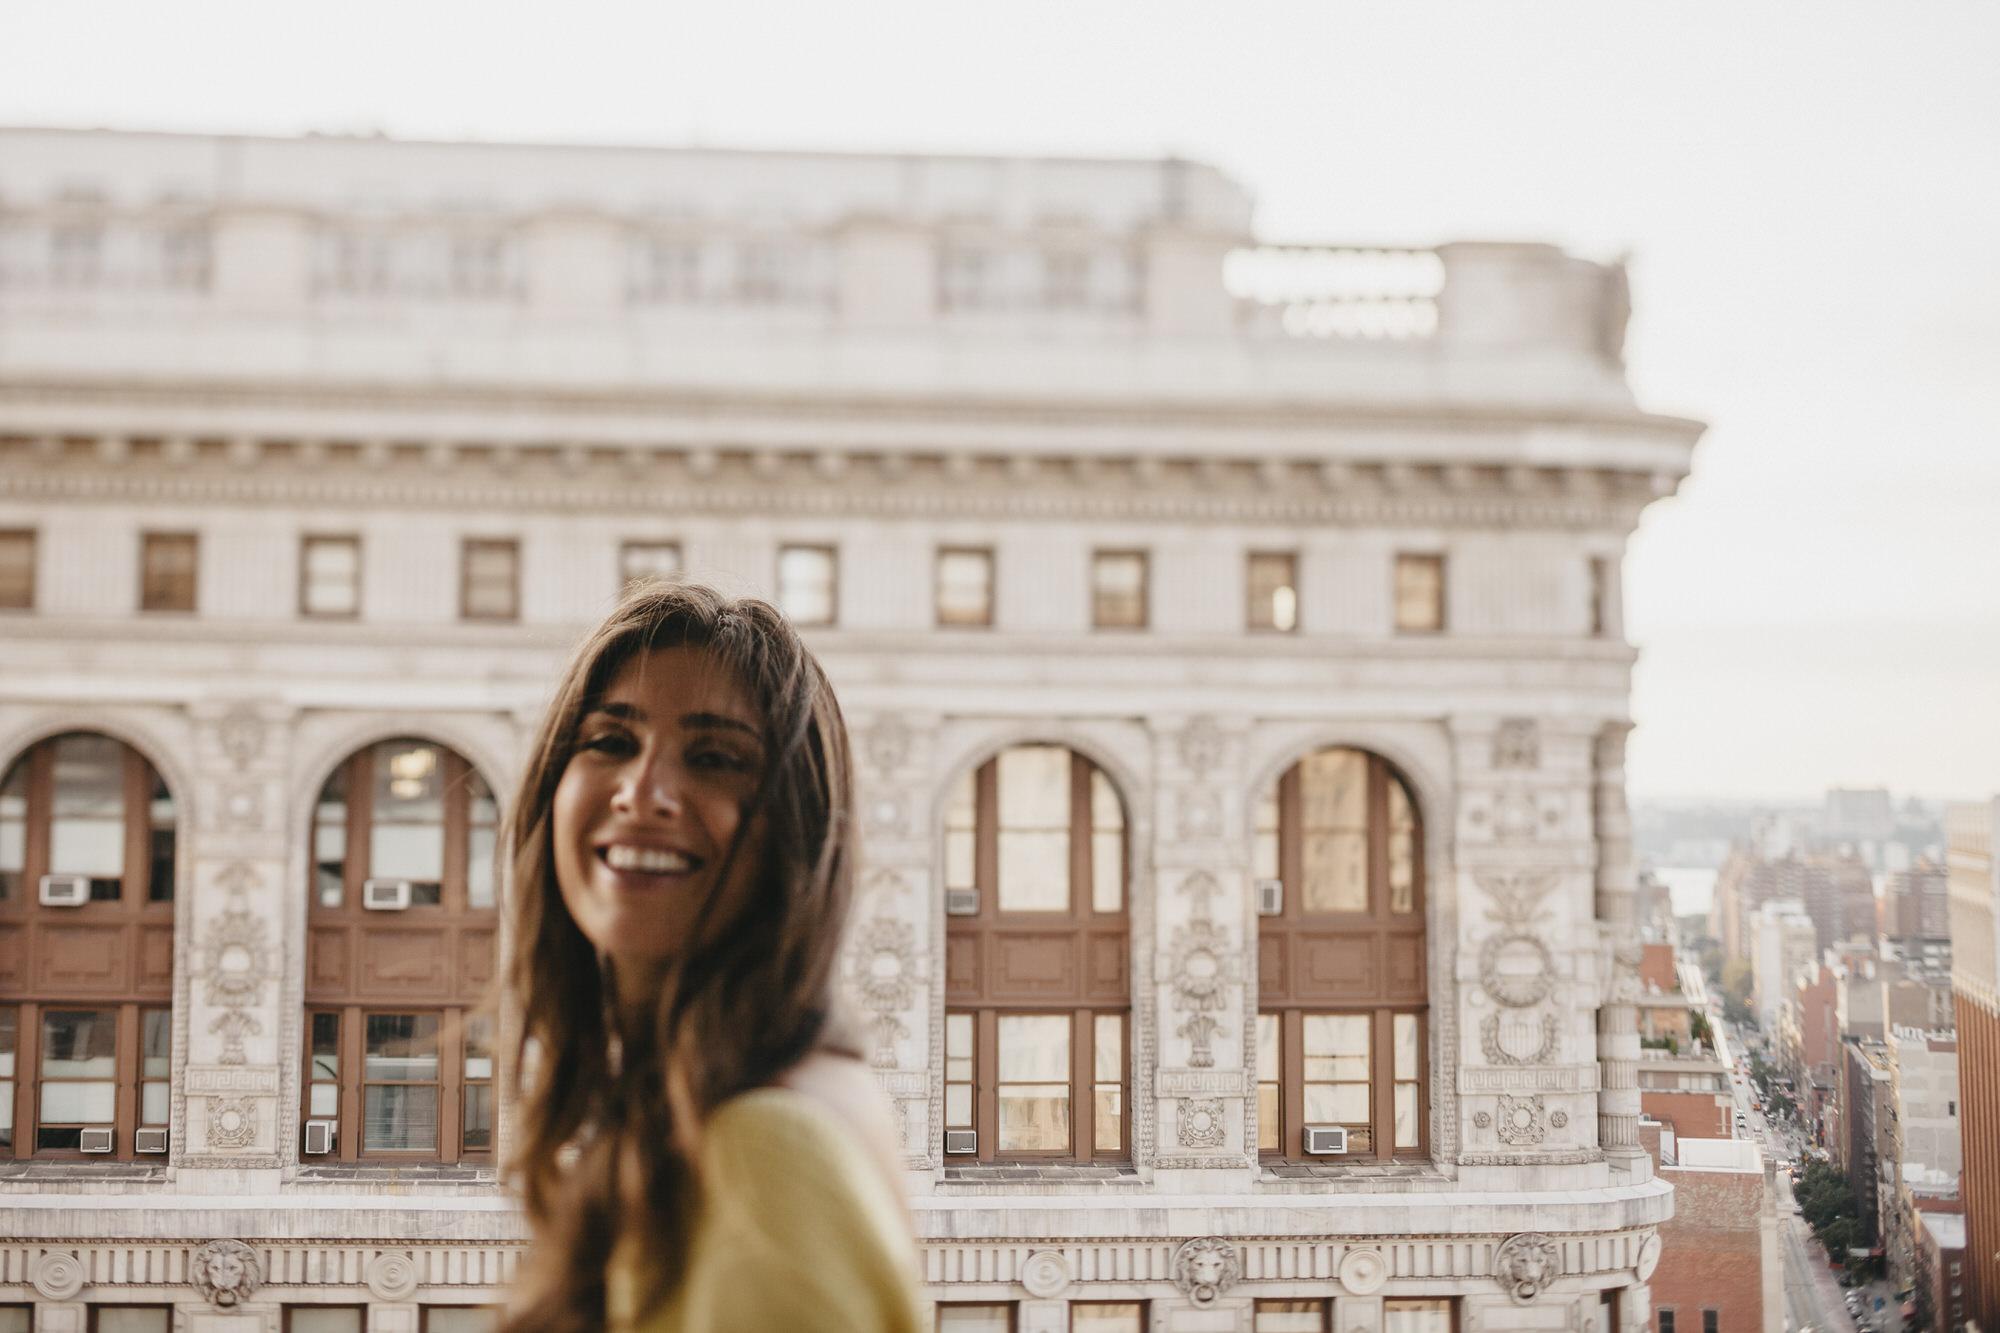 Chloe-Jay-Eng-NYC-1029.jpg